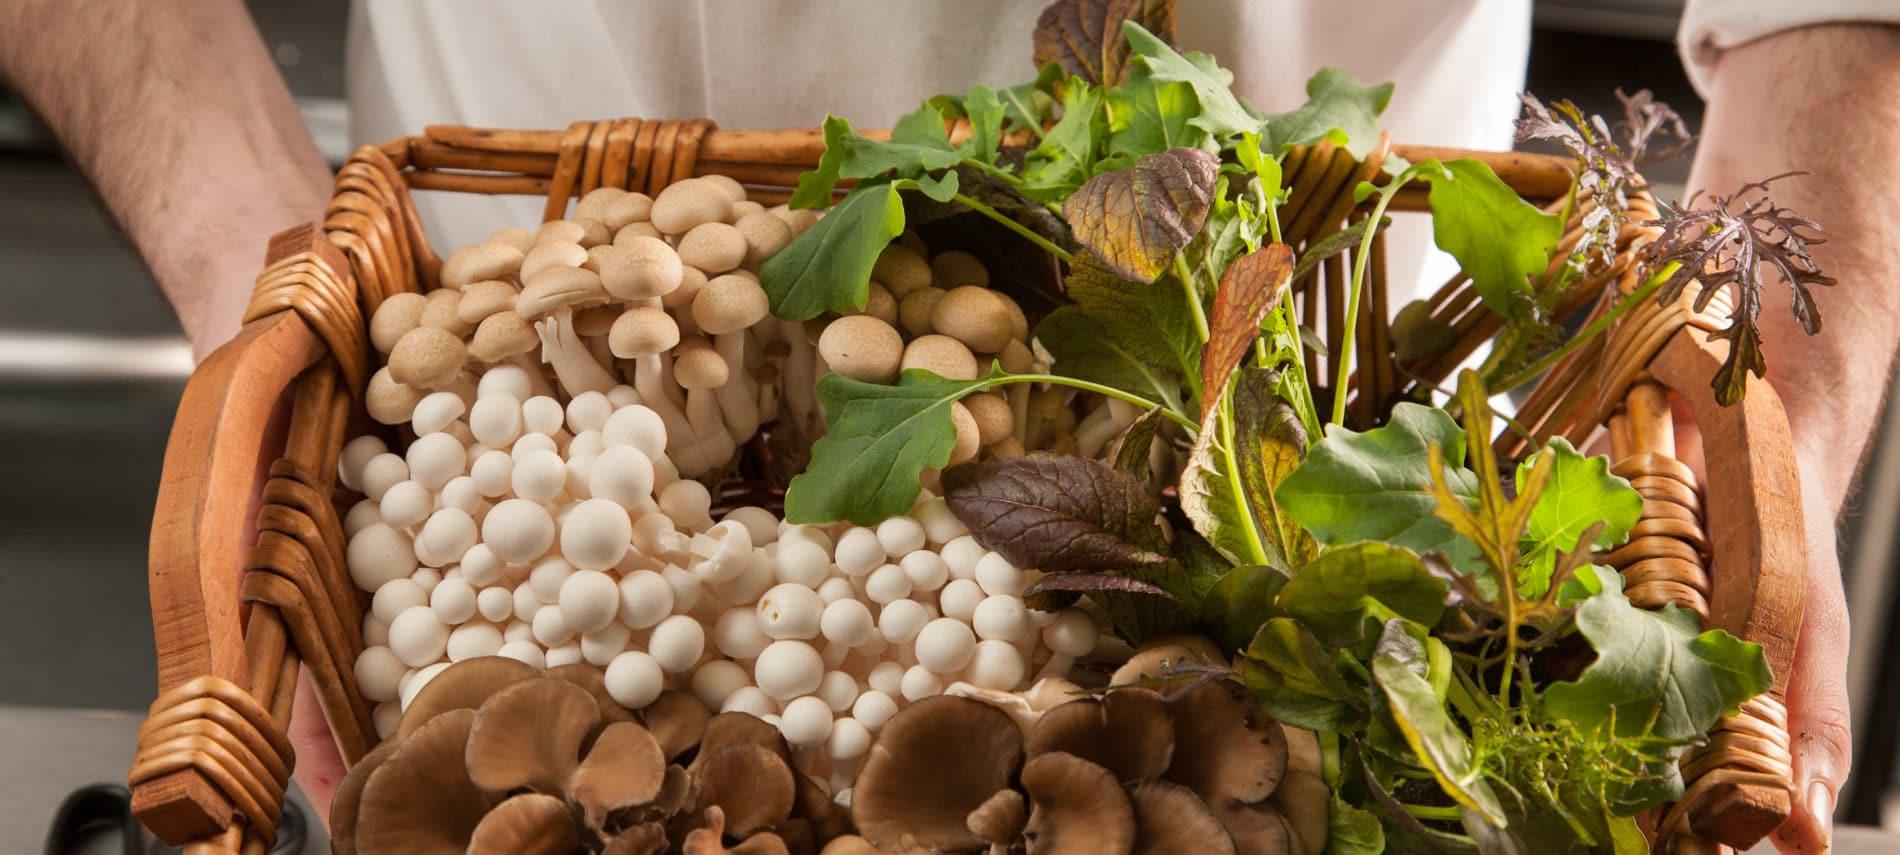 a wicker basket full of fresh mushrooms